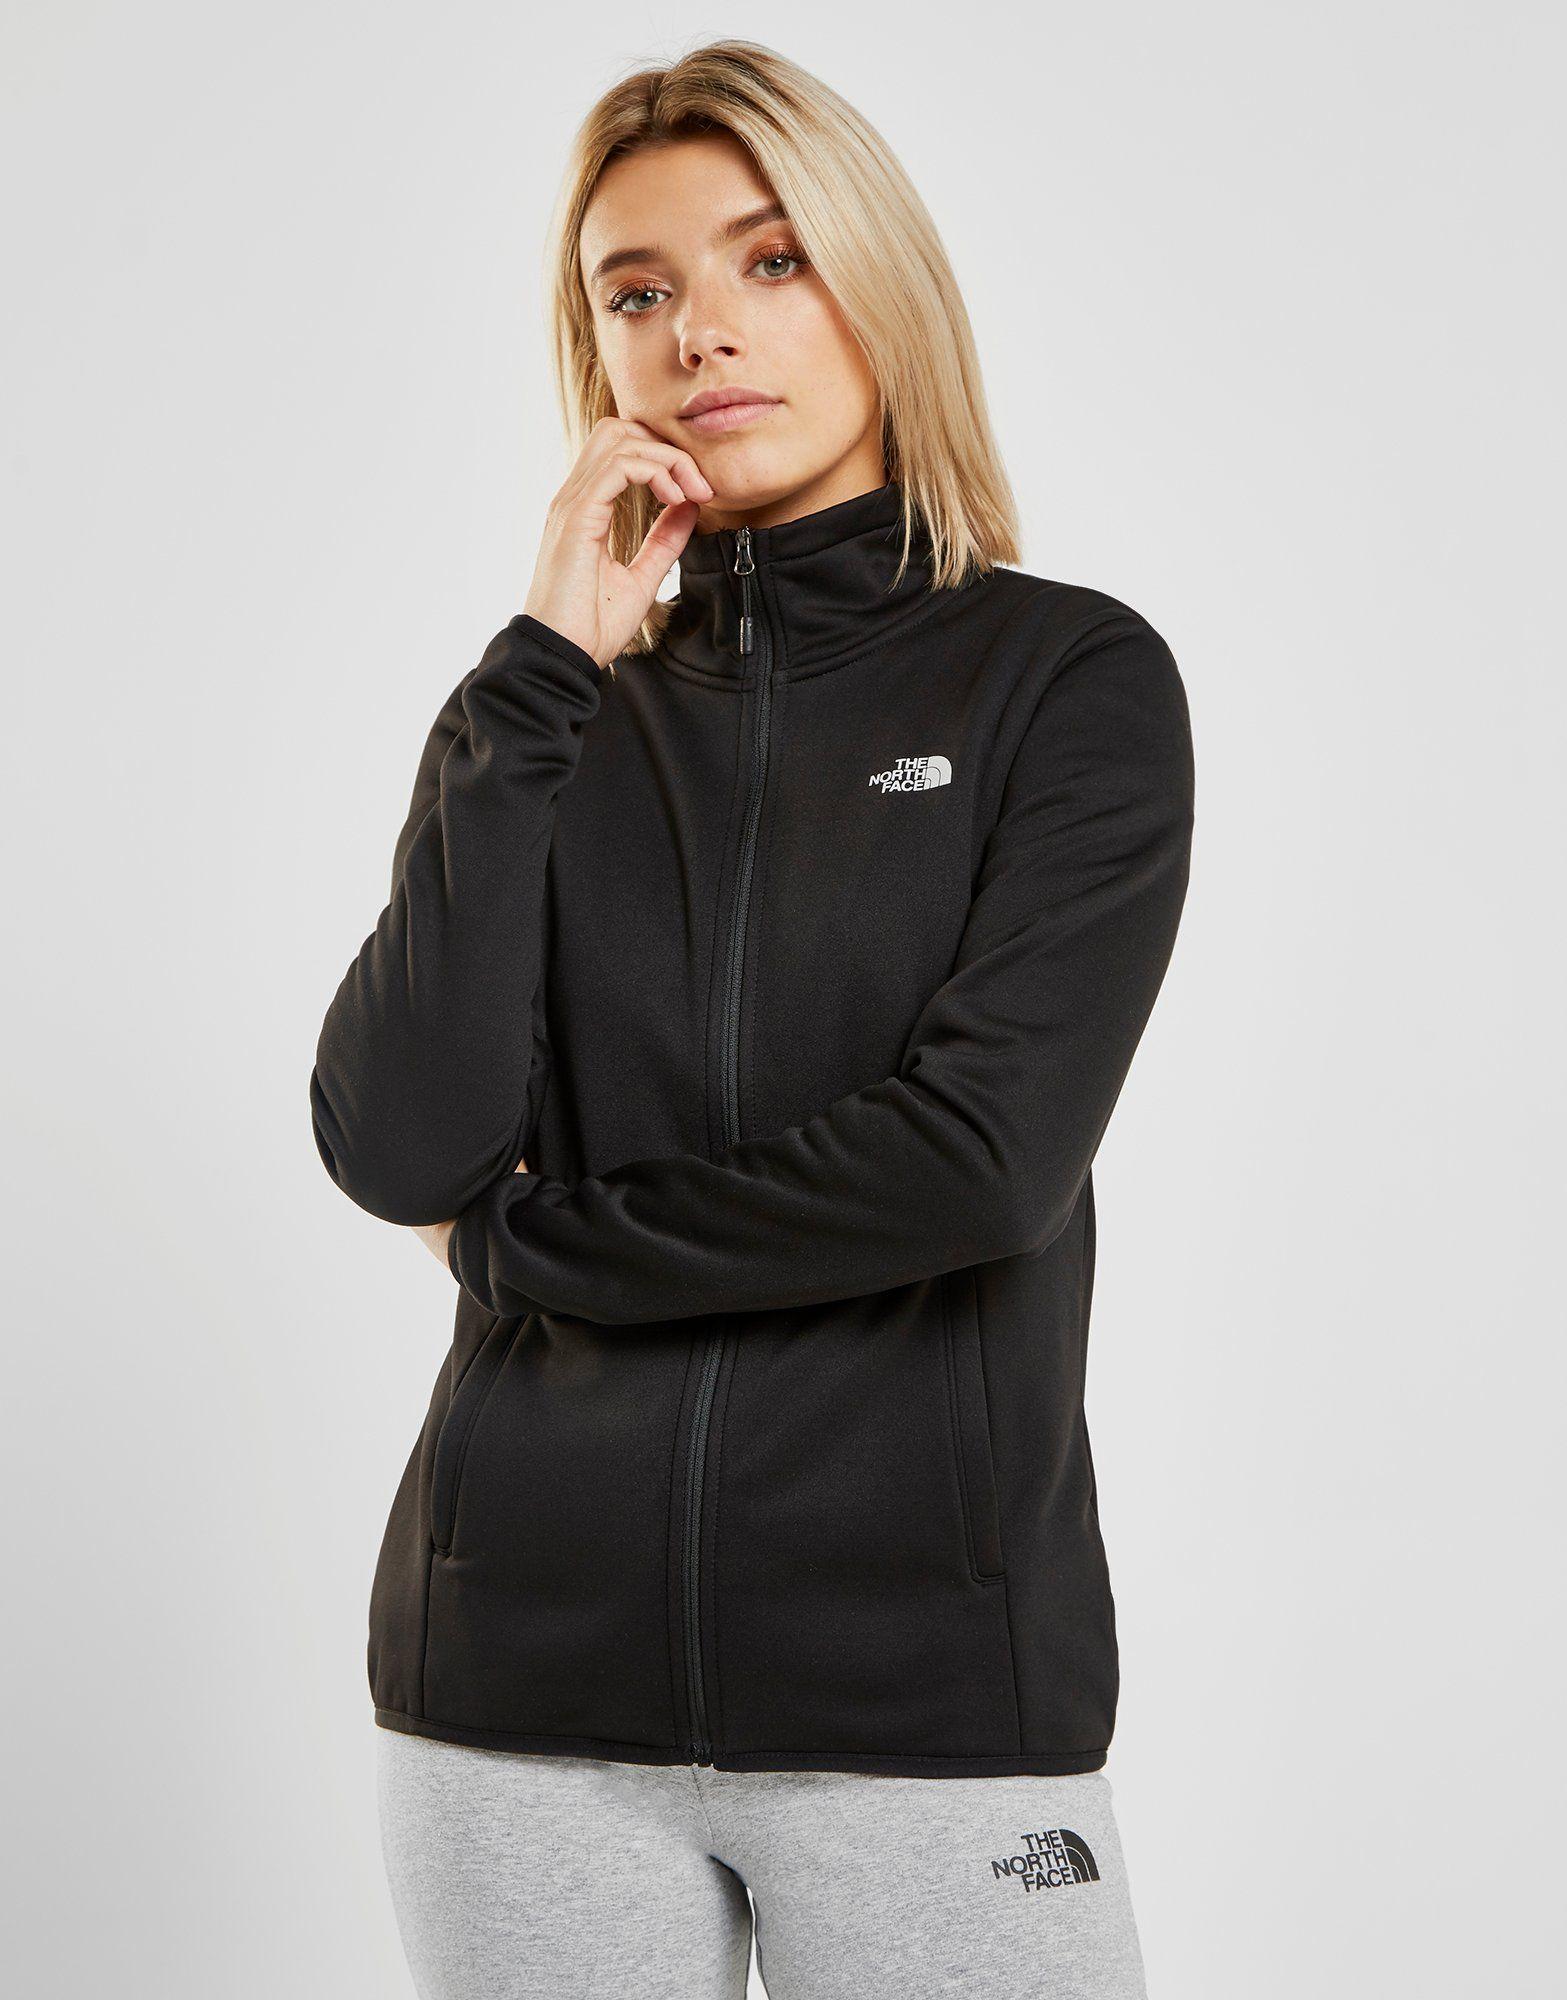 The North Face chaqueta Tanken